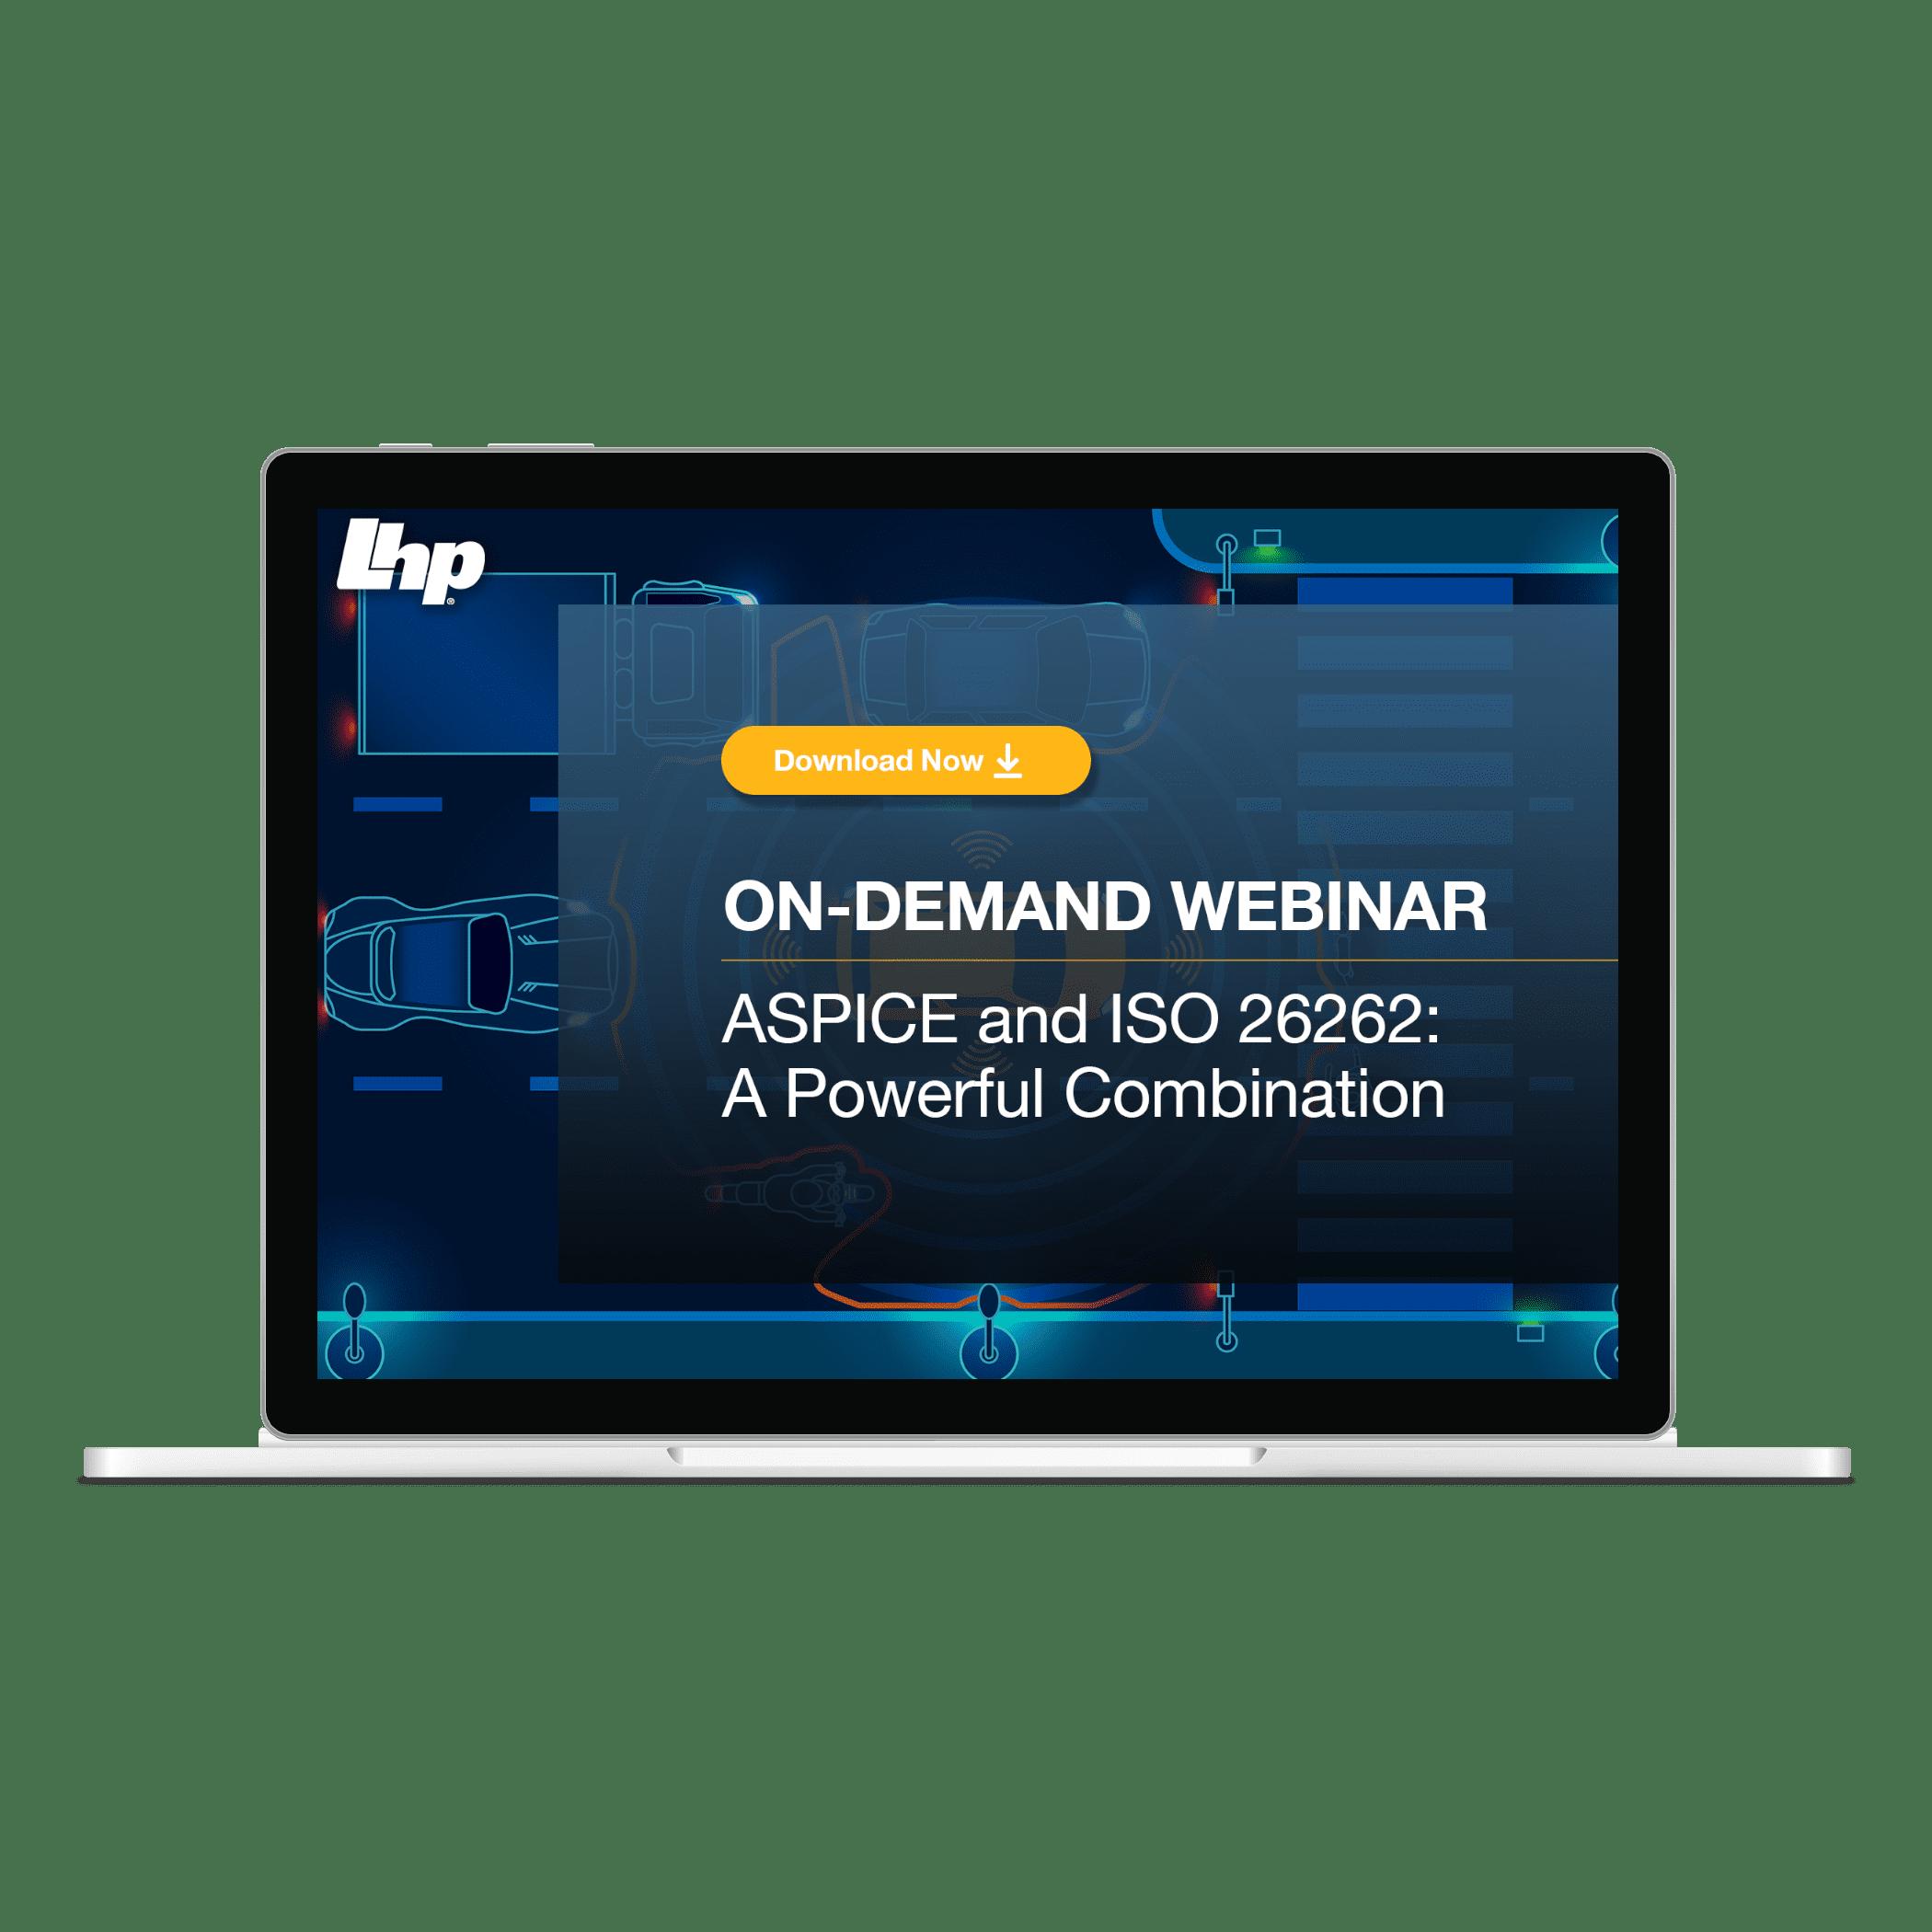 On Demand Webinar - ISO 26262 & ASPICE: A Powerful Combination